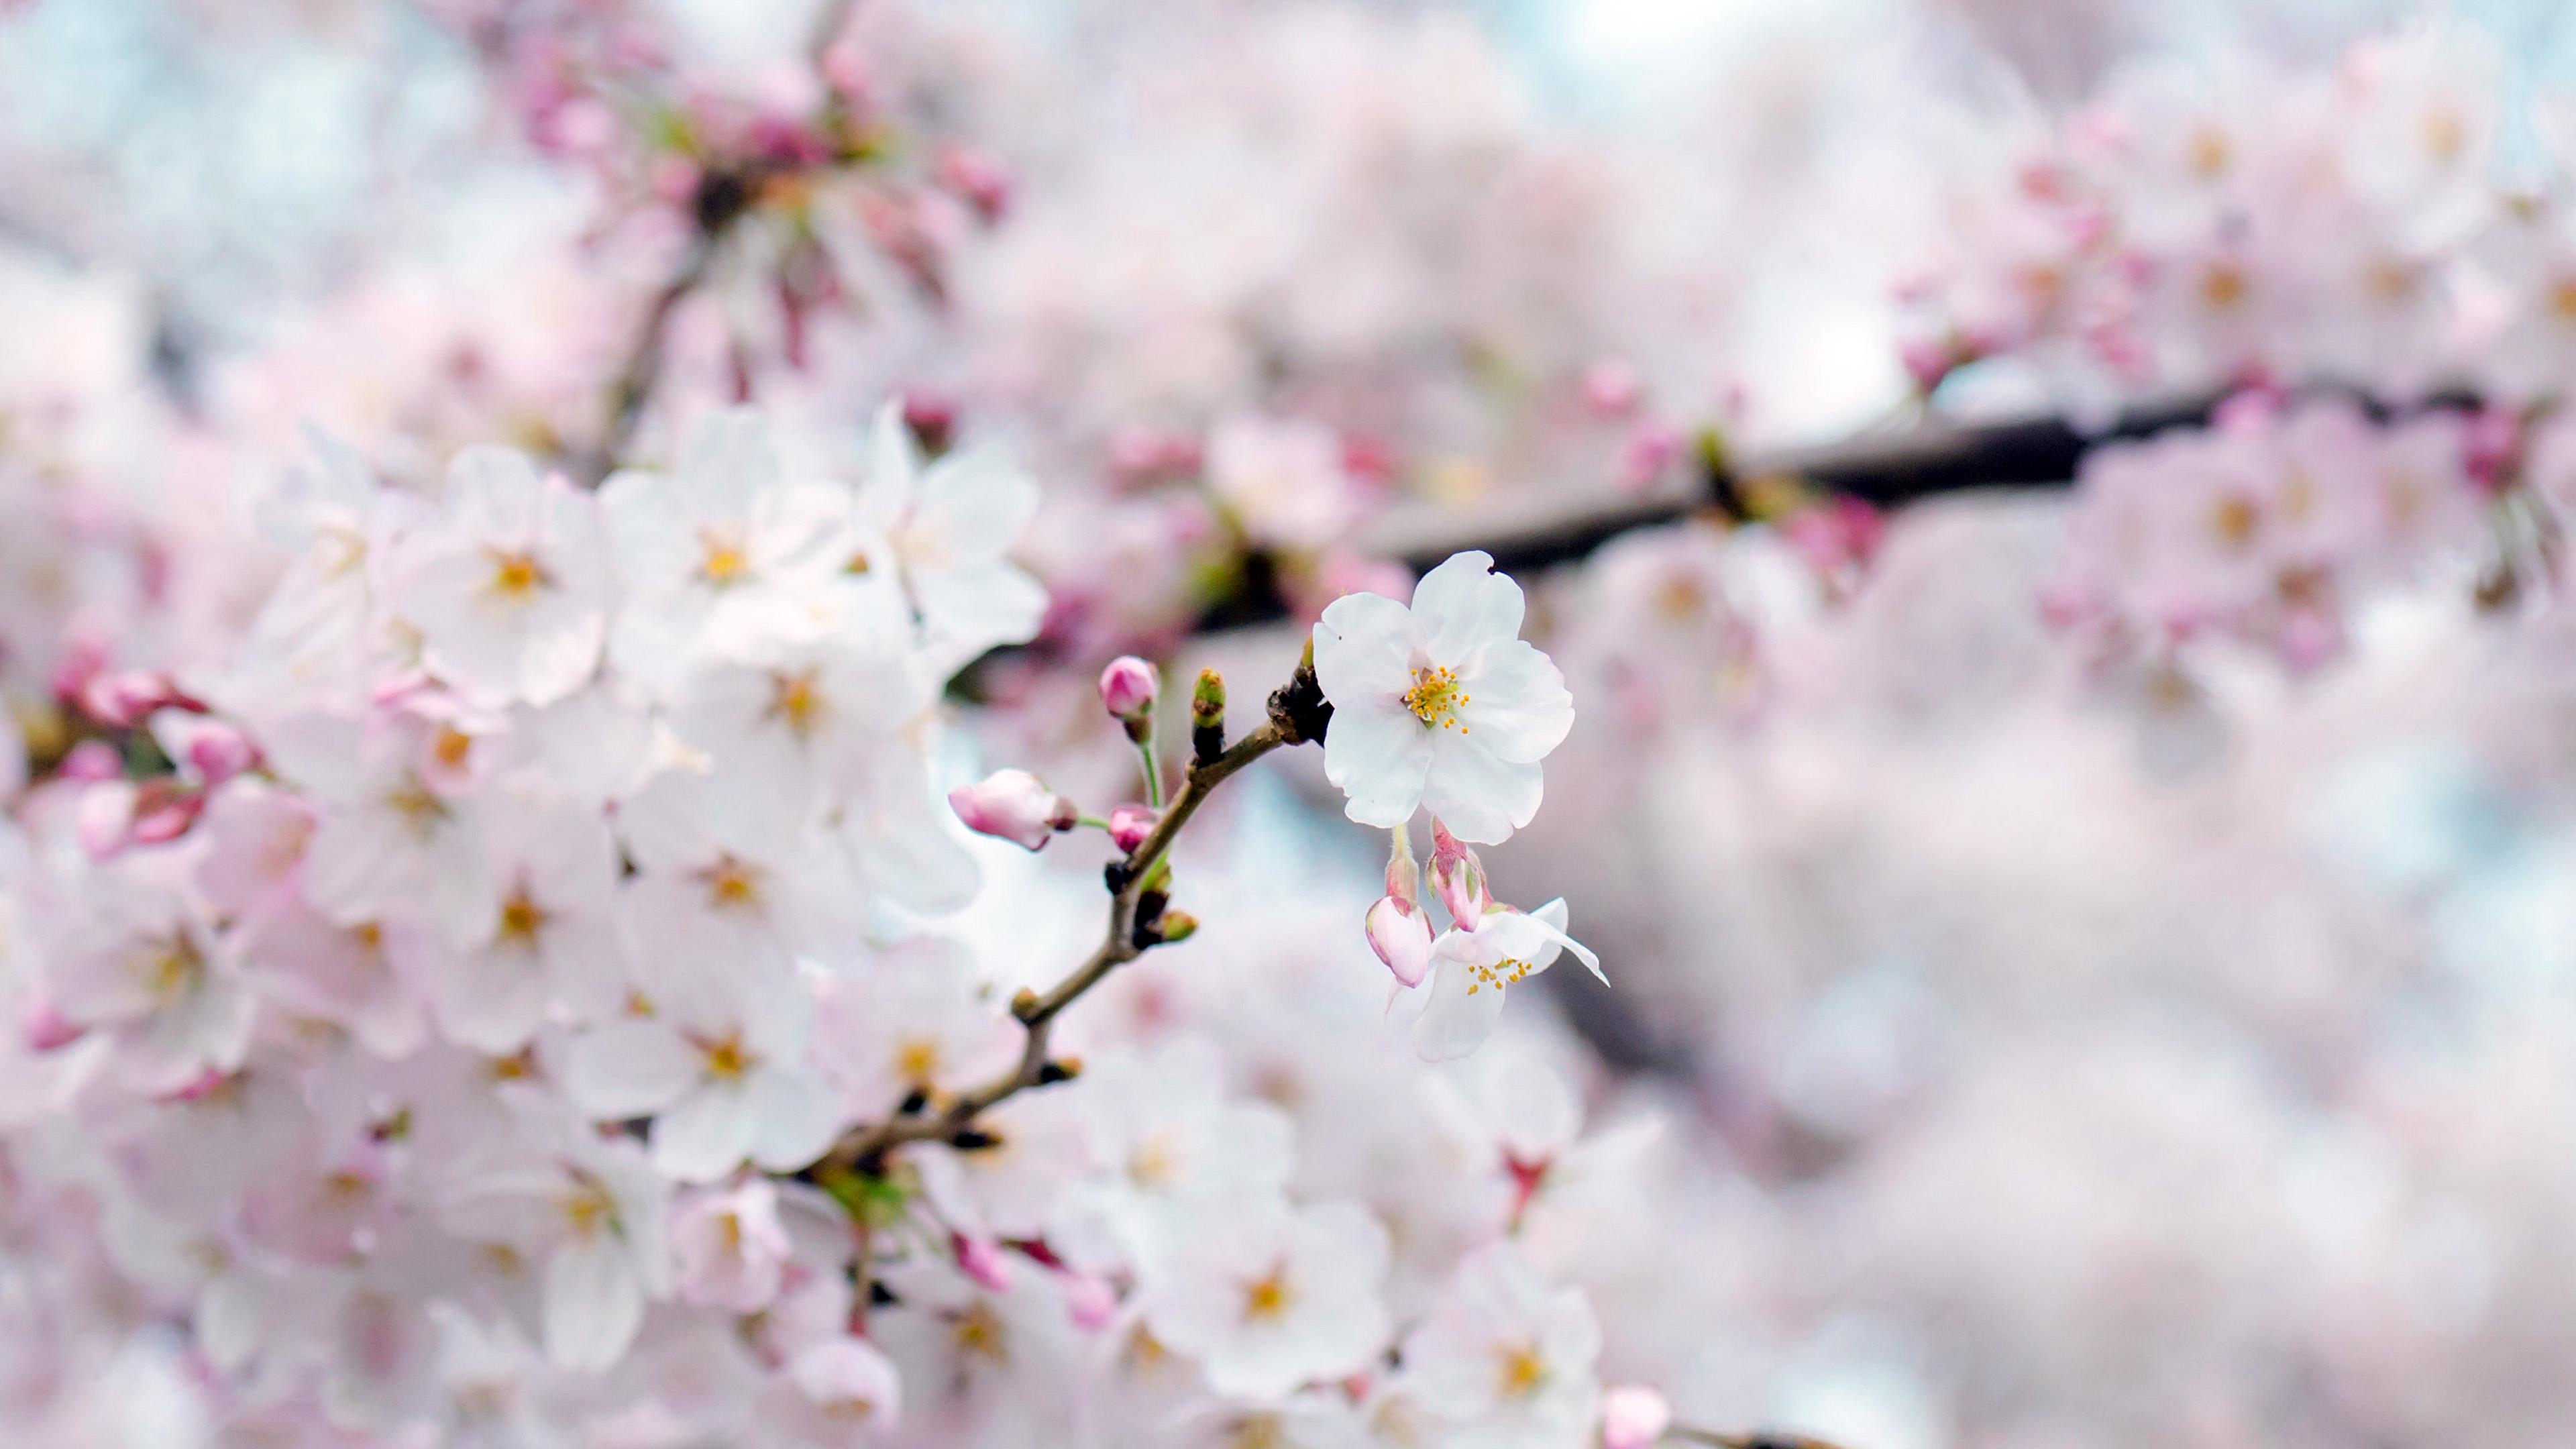 Iphone 7 Fall Wallpaper Nx70 Cherry Blossom Flower Spring Tree Bokeh Nature Wallpaper